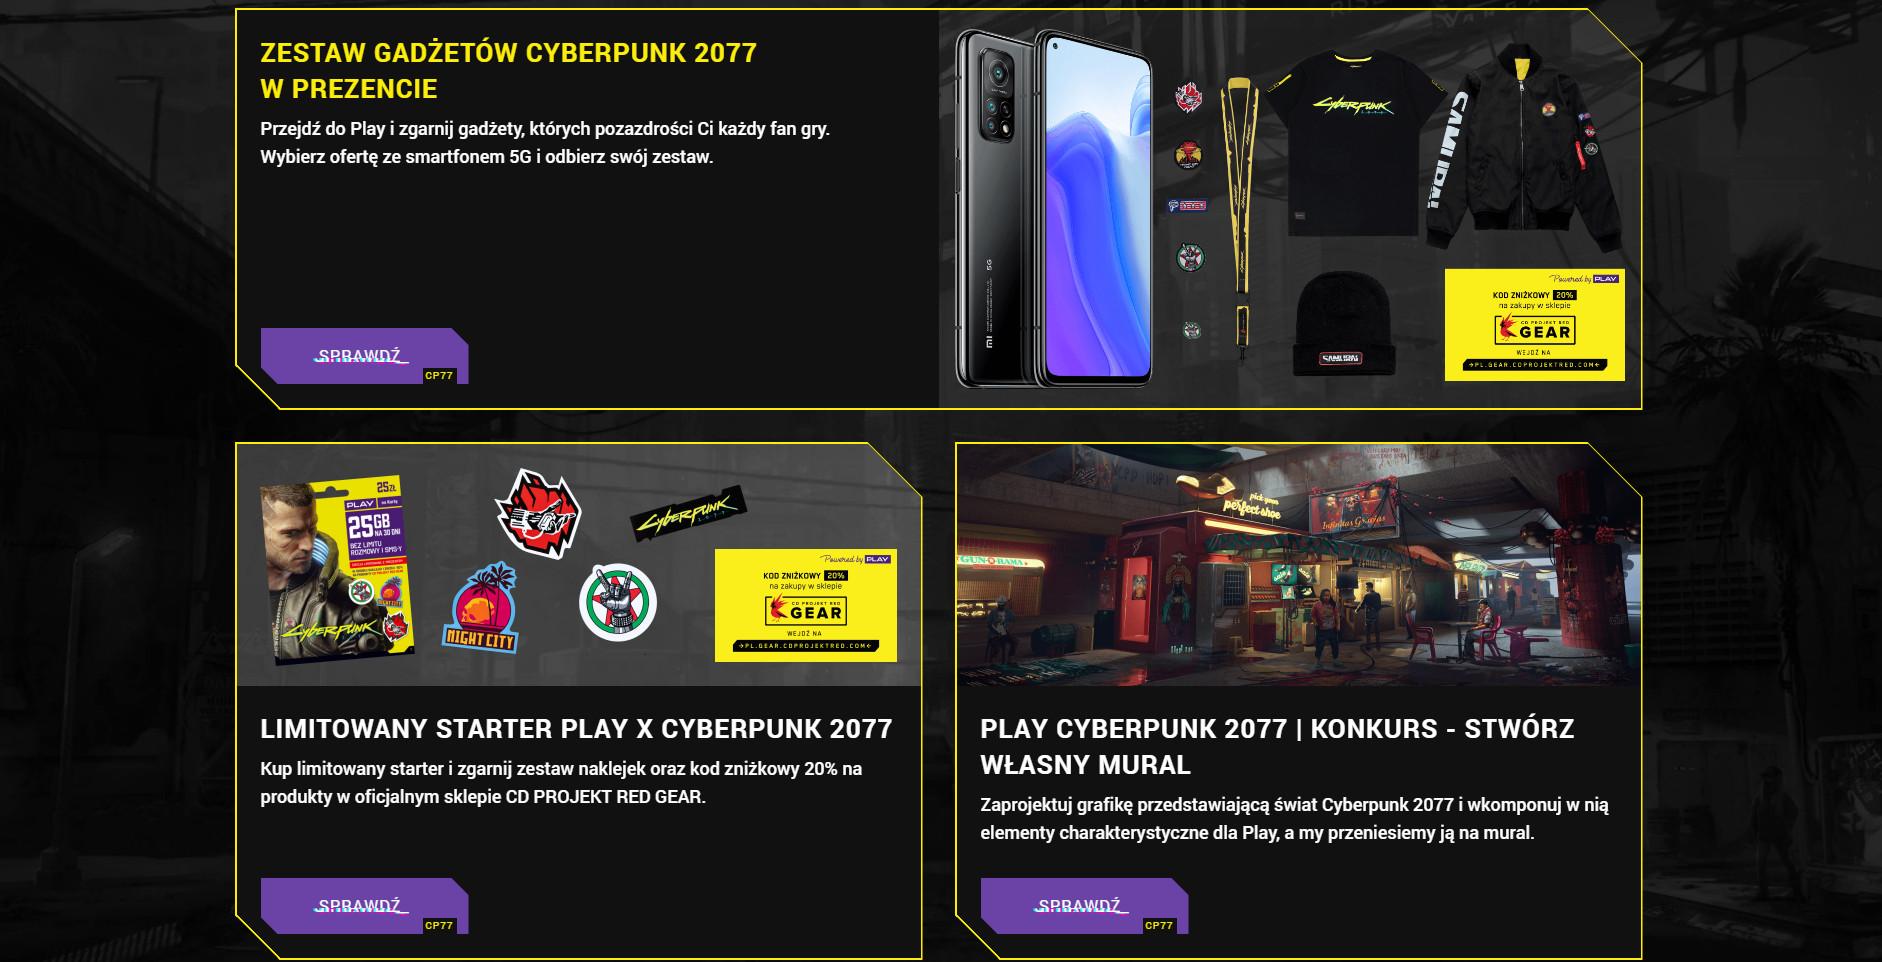 Cyberpunk 2077 sieć Play promocja